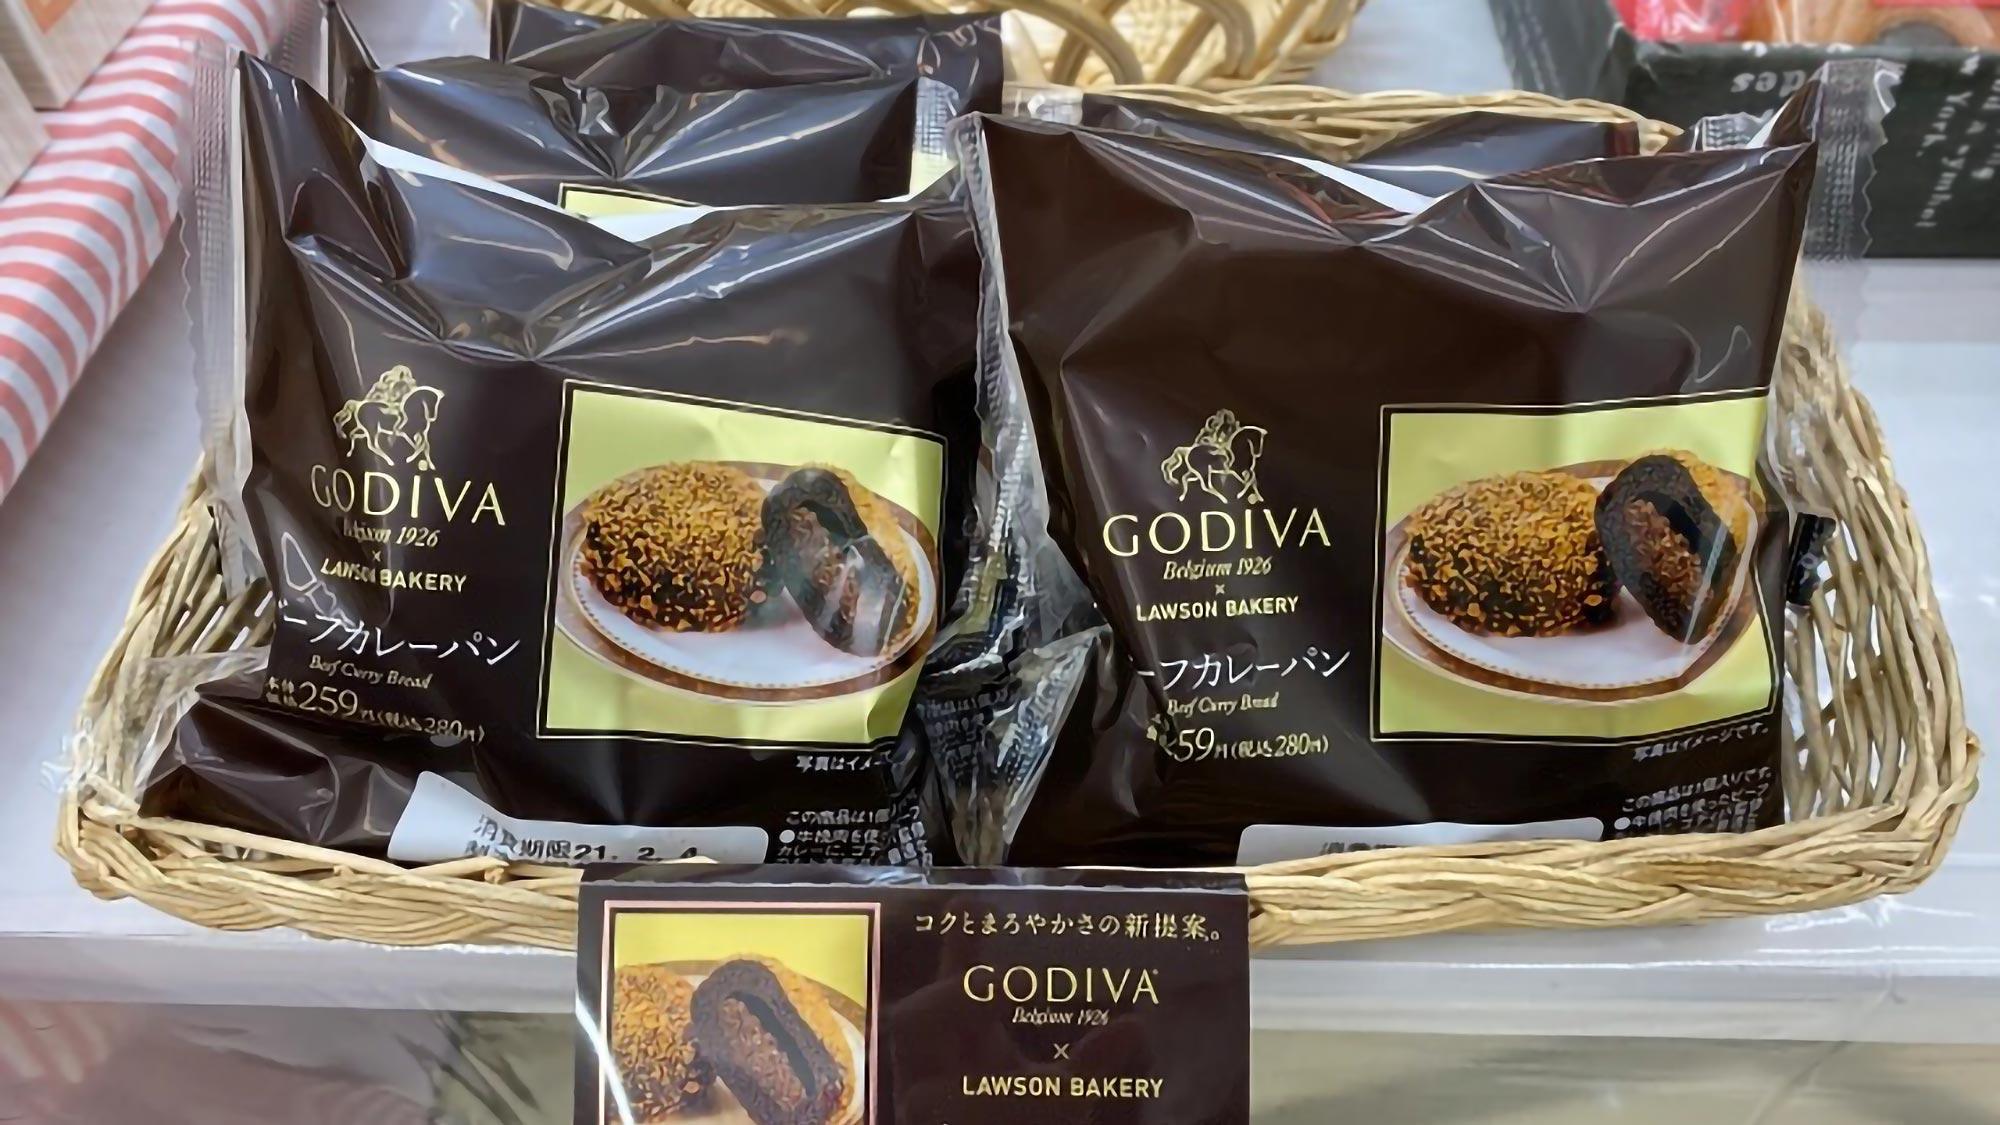 Godiva x Lawson Bakery Beef Curry Bread